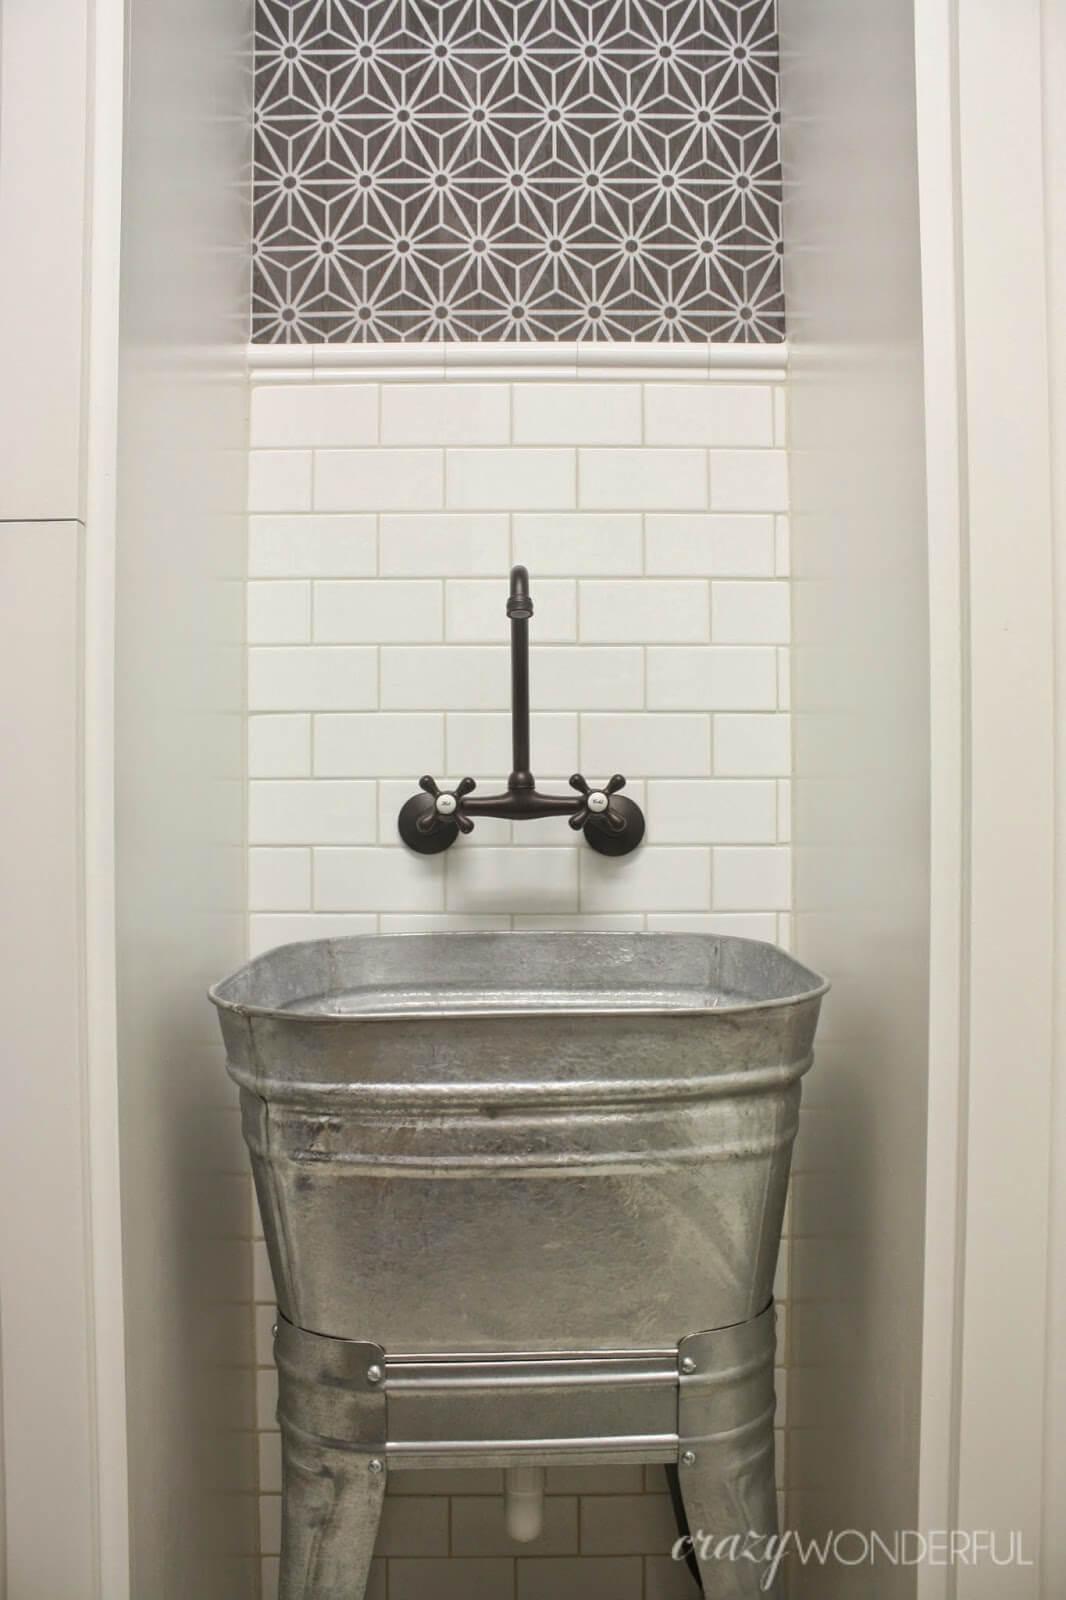 Great Grains Galvanized Metal Wash Tub